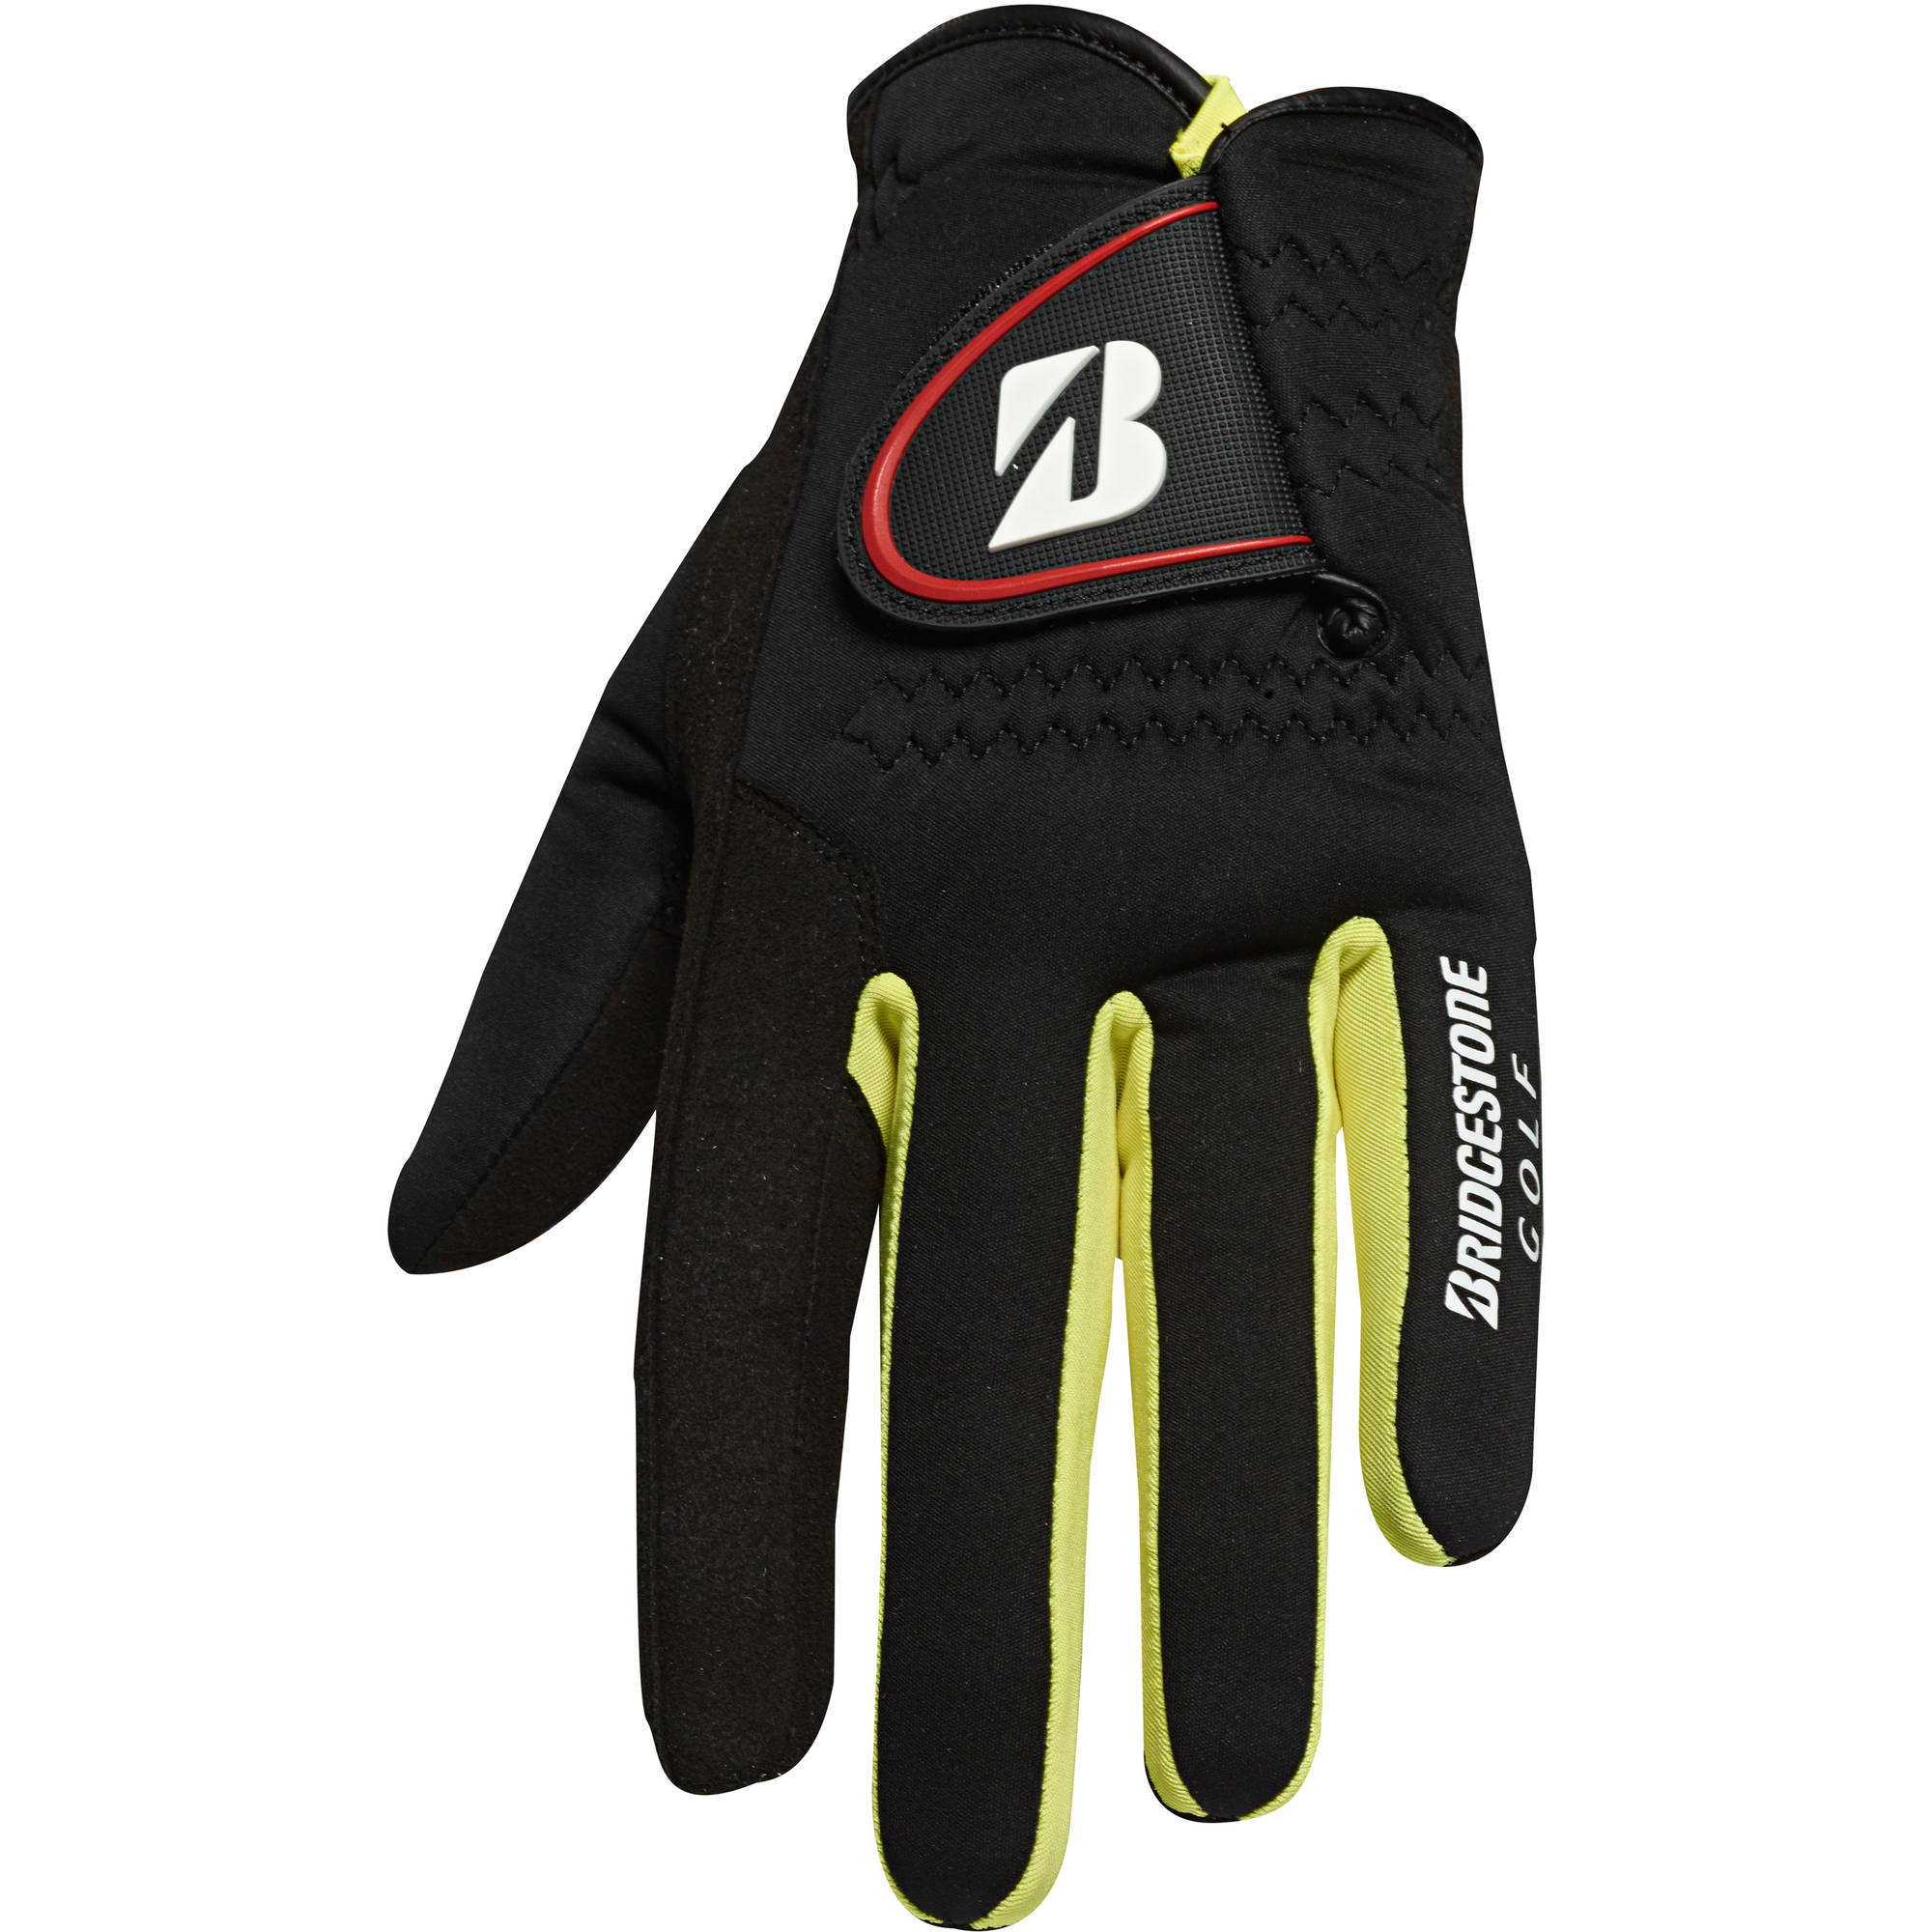 Bridgestone Golf BarriCold Winter Golf Glove 2-Pack, LH Reg Medium by Bridgestone